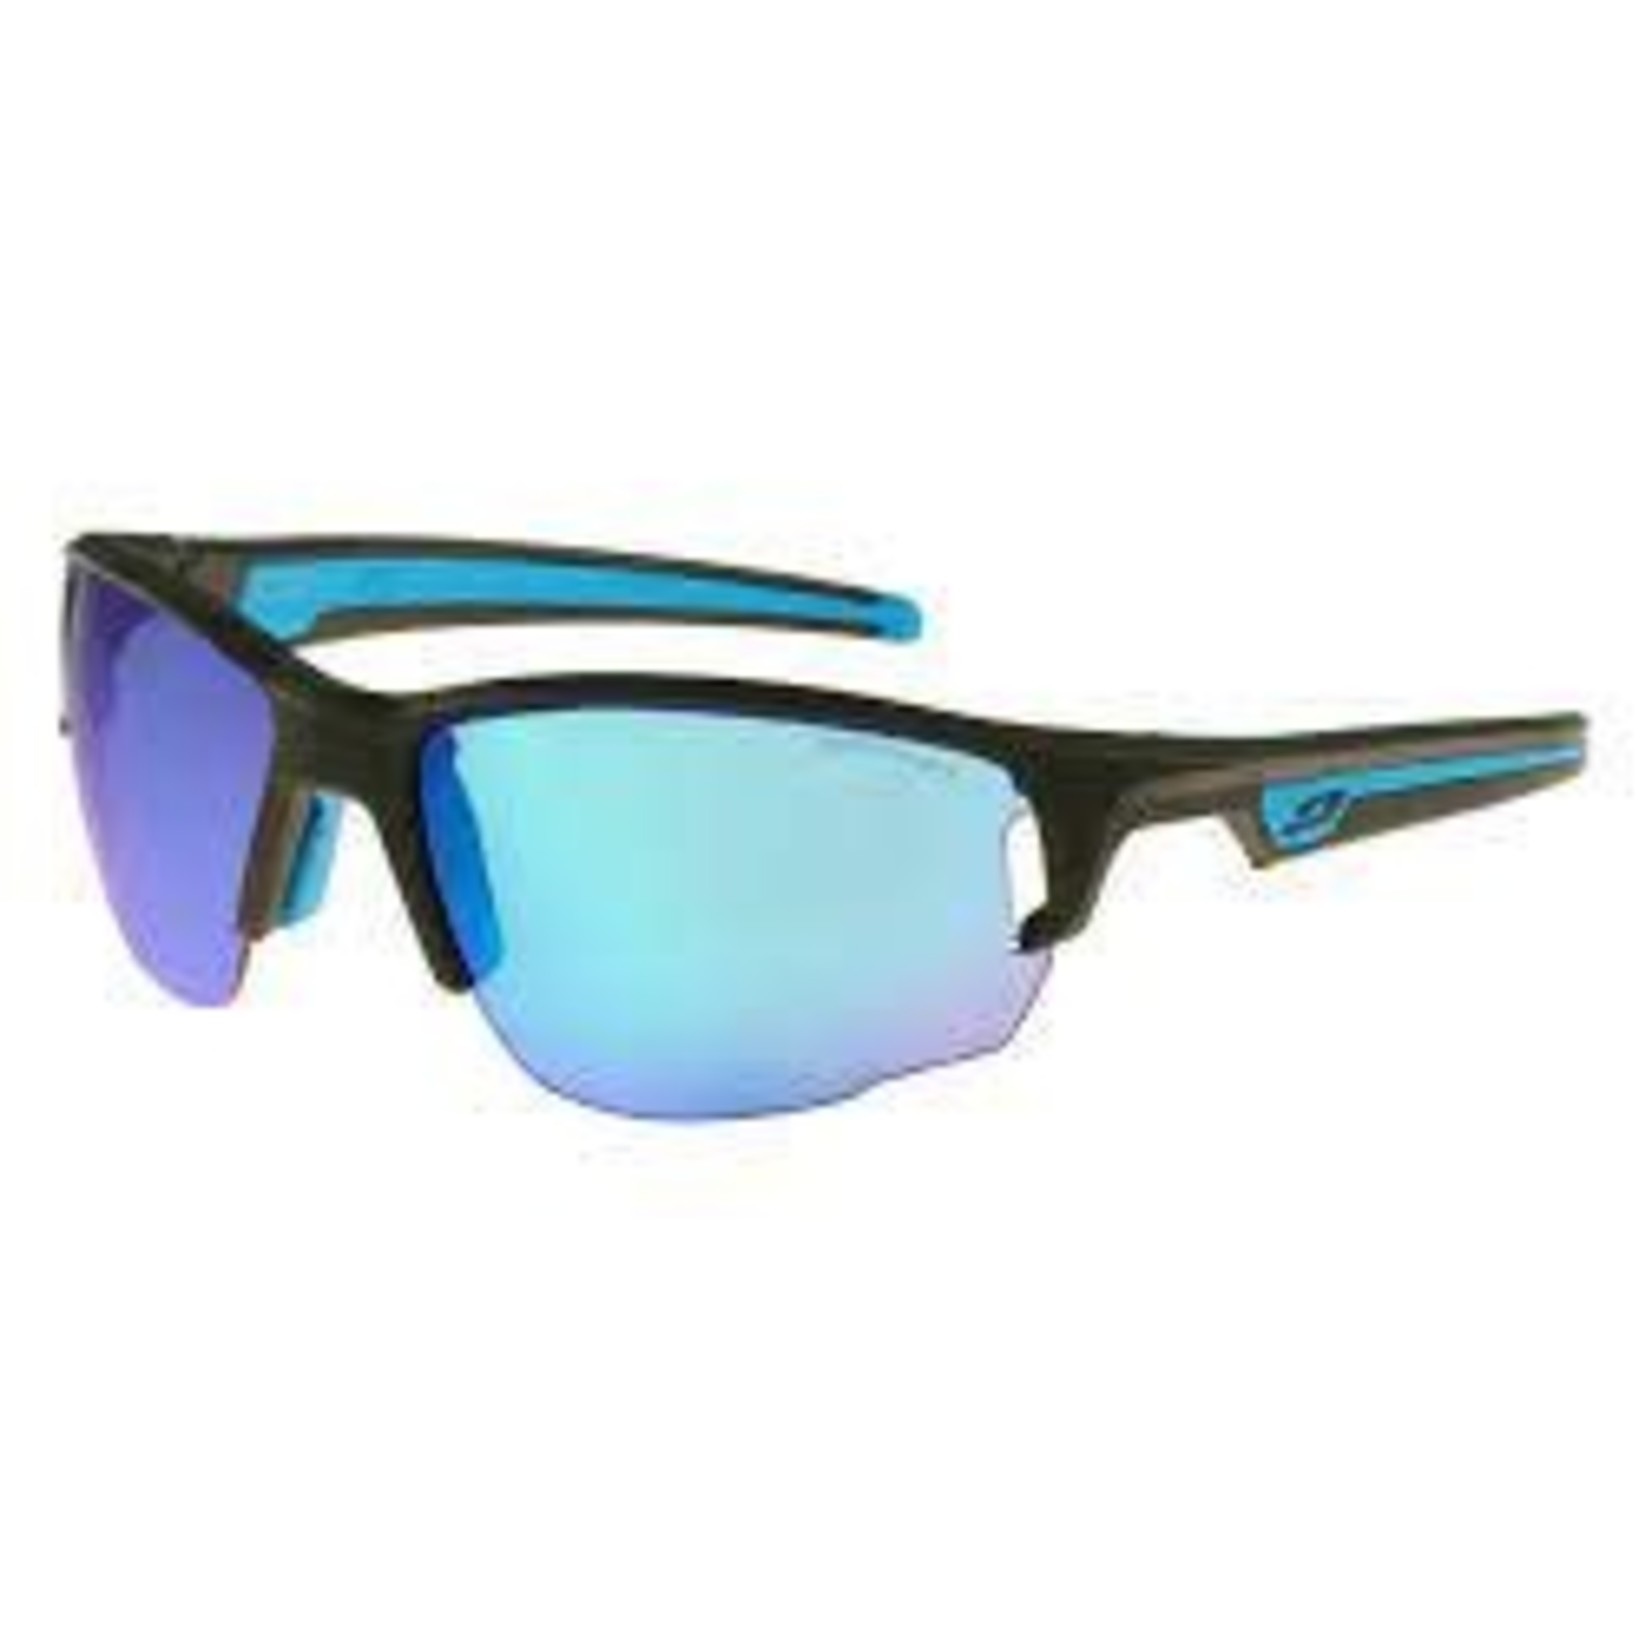 Julbo Julbo Venturi Sunglasses - Unisex